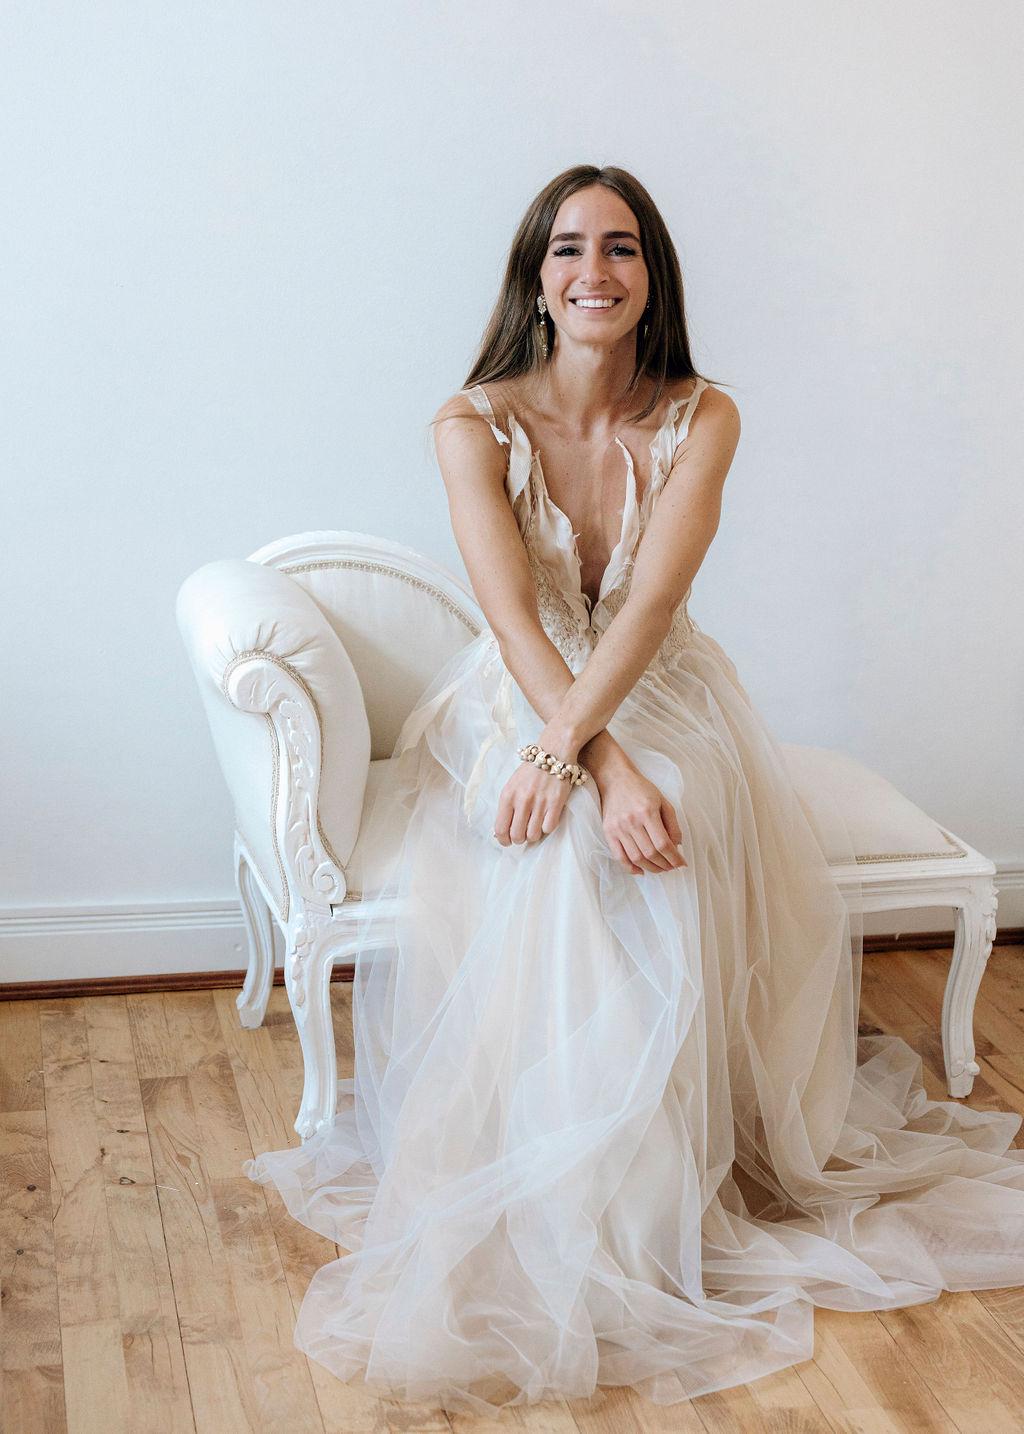 Unikat Brautkleid mit Tüll und Seide